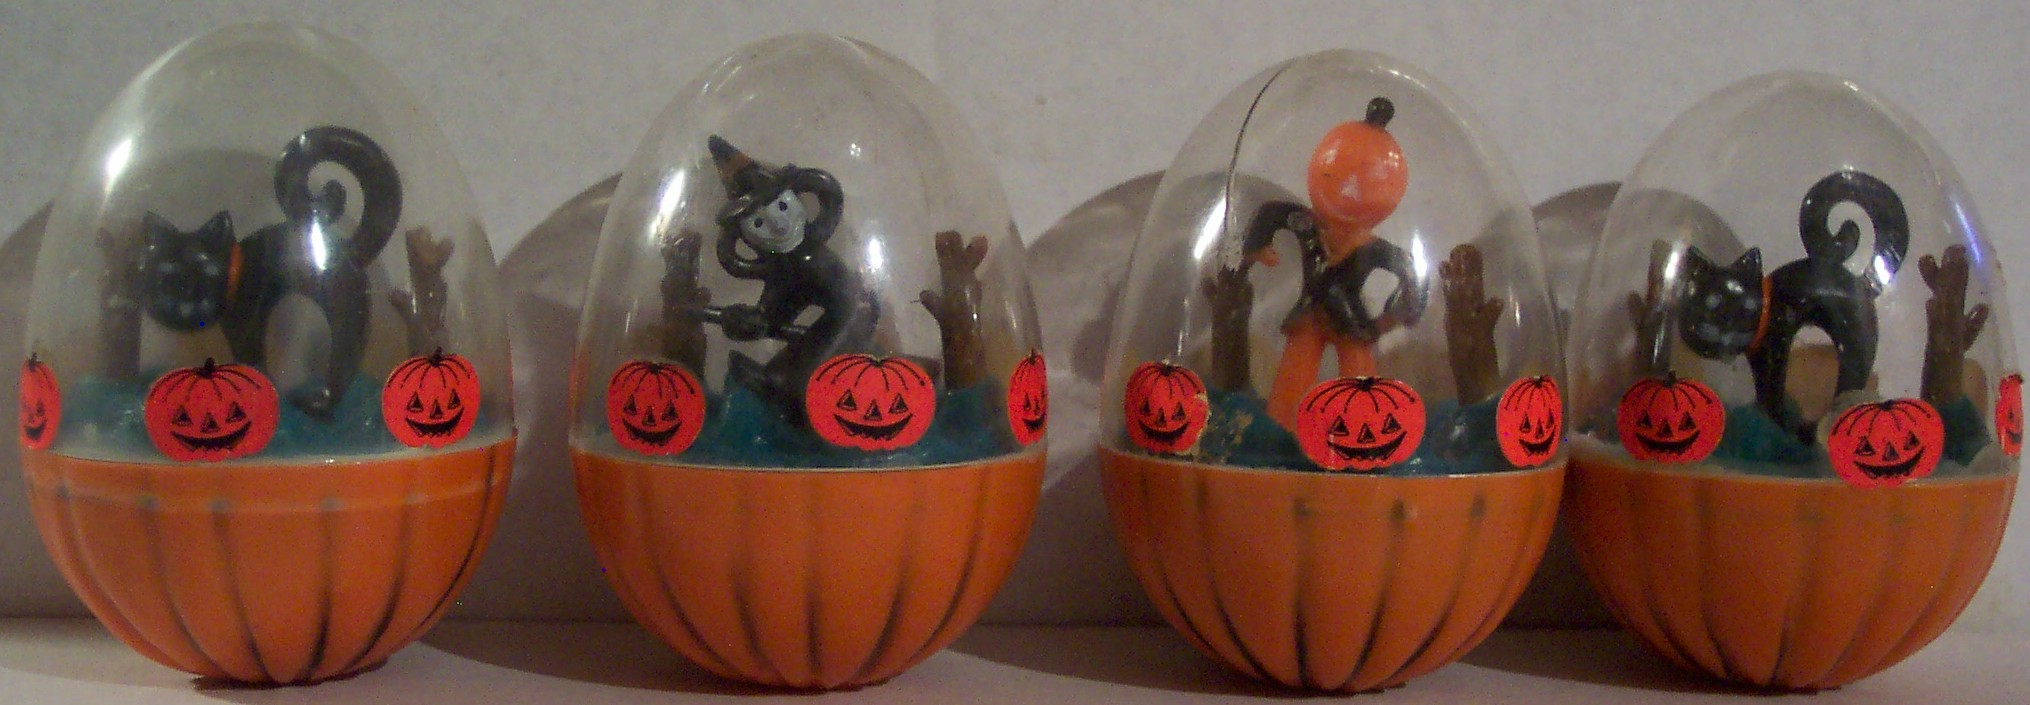 Vintage Halloween Decorations Plastic  Viewing Gallery - Plastic Halloween Decorations